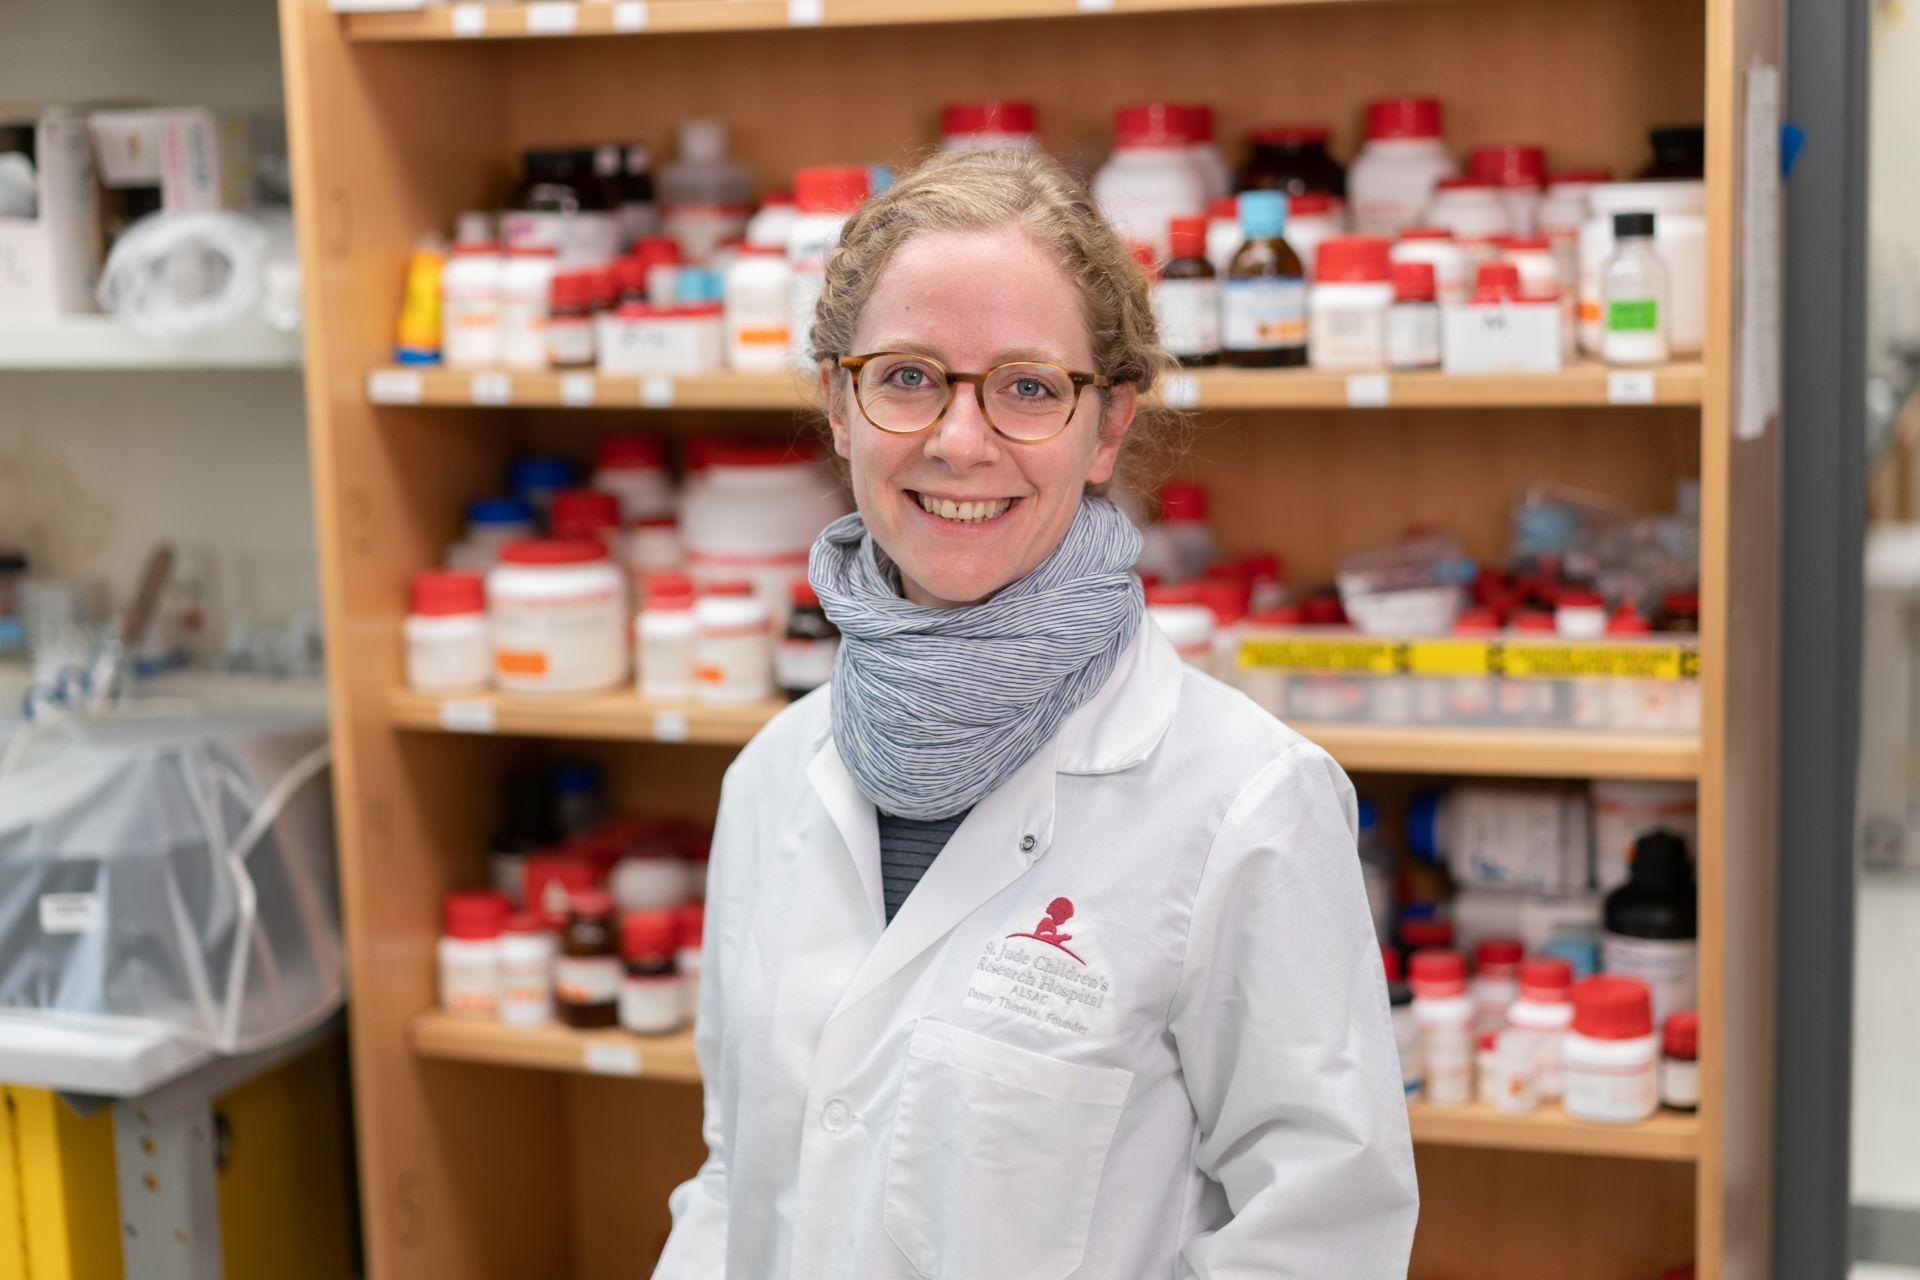 Swantje Leidmann, PhD